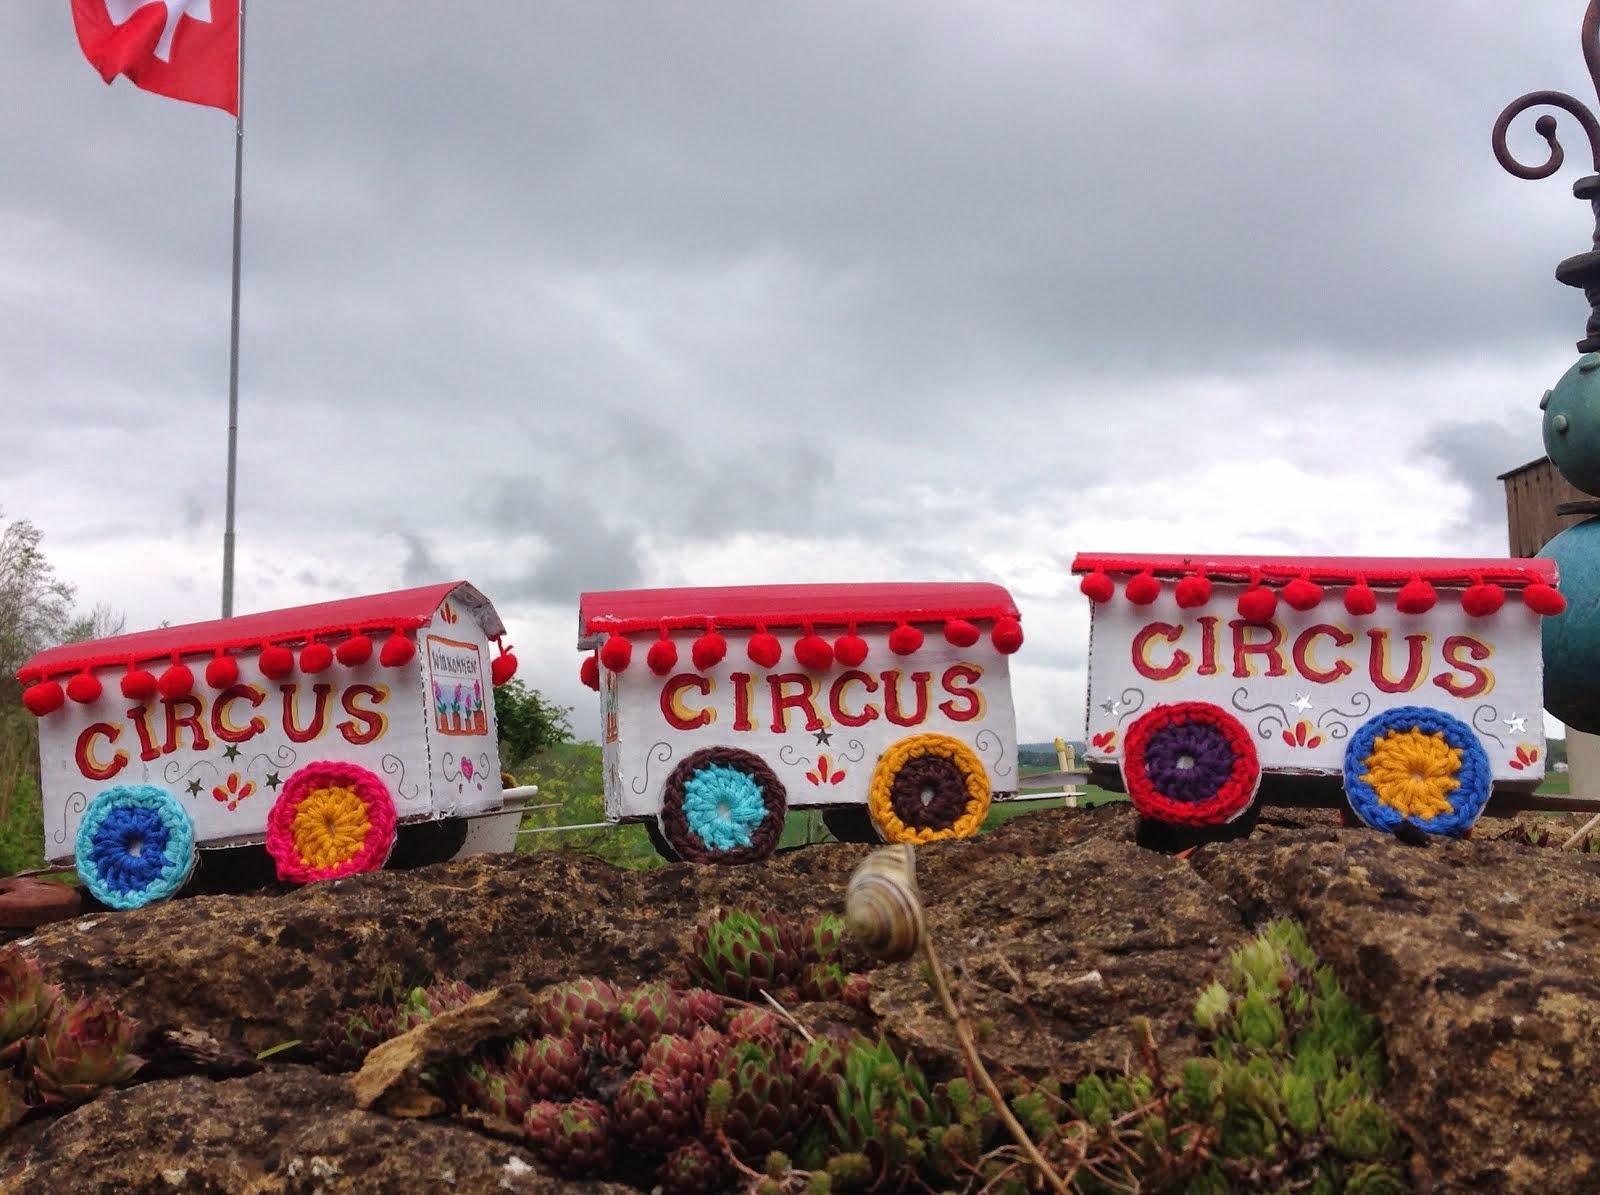 Circuswagen aus Karton